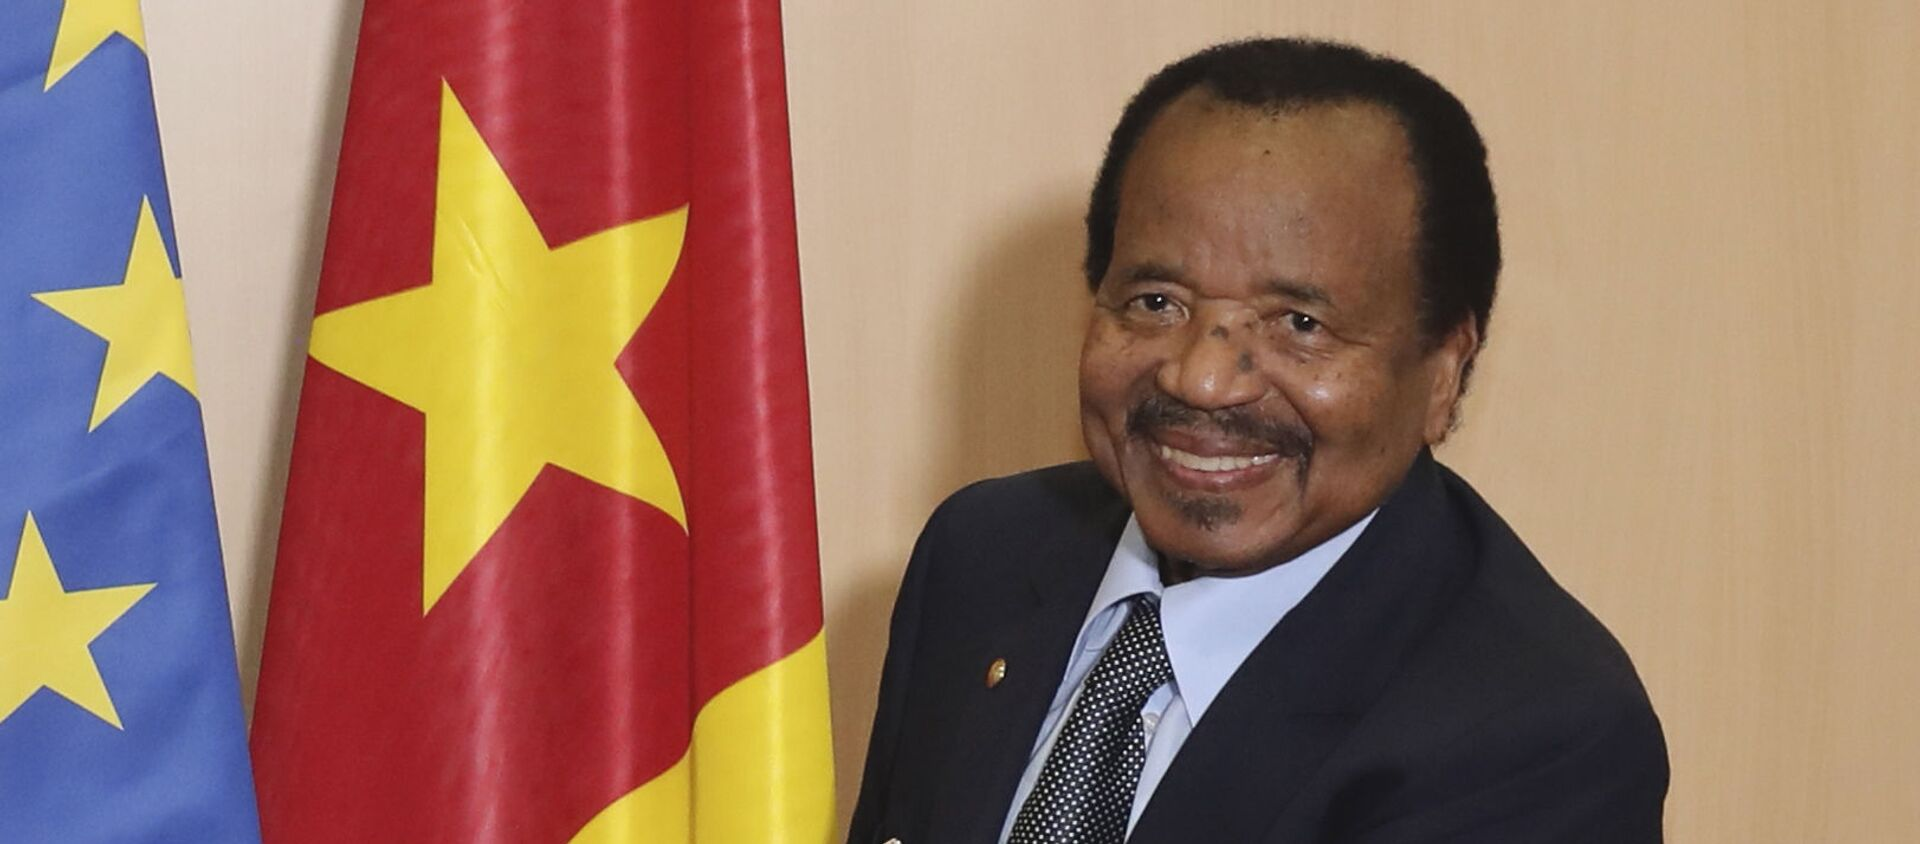 Paul Biya, Président du Cameroun - Sputnik France, 1920, 08.07.2021